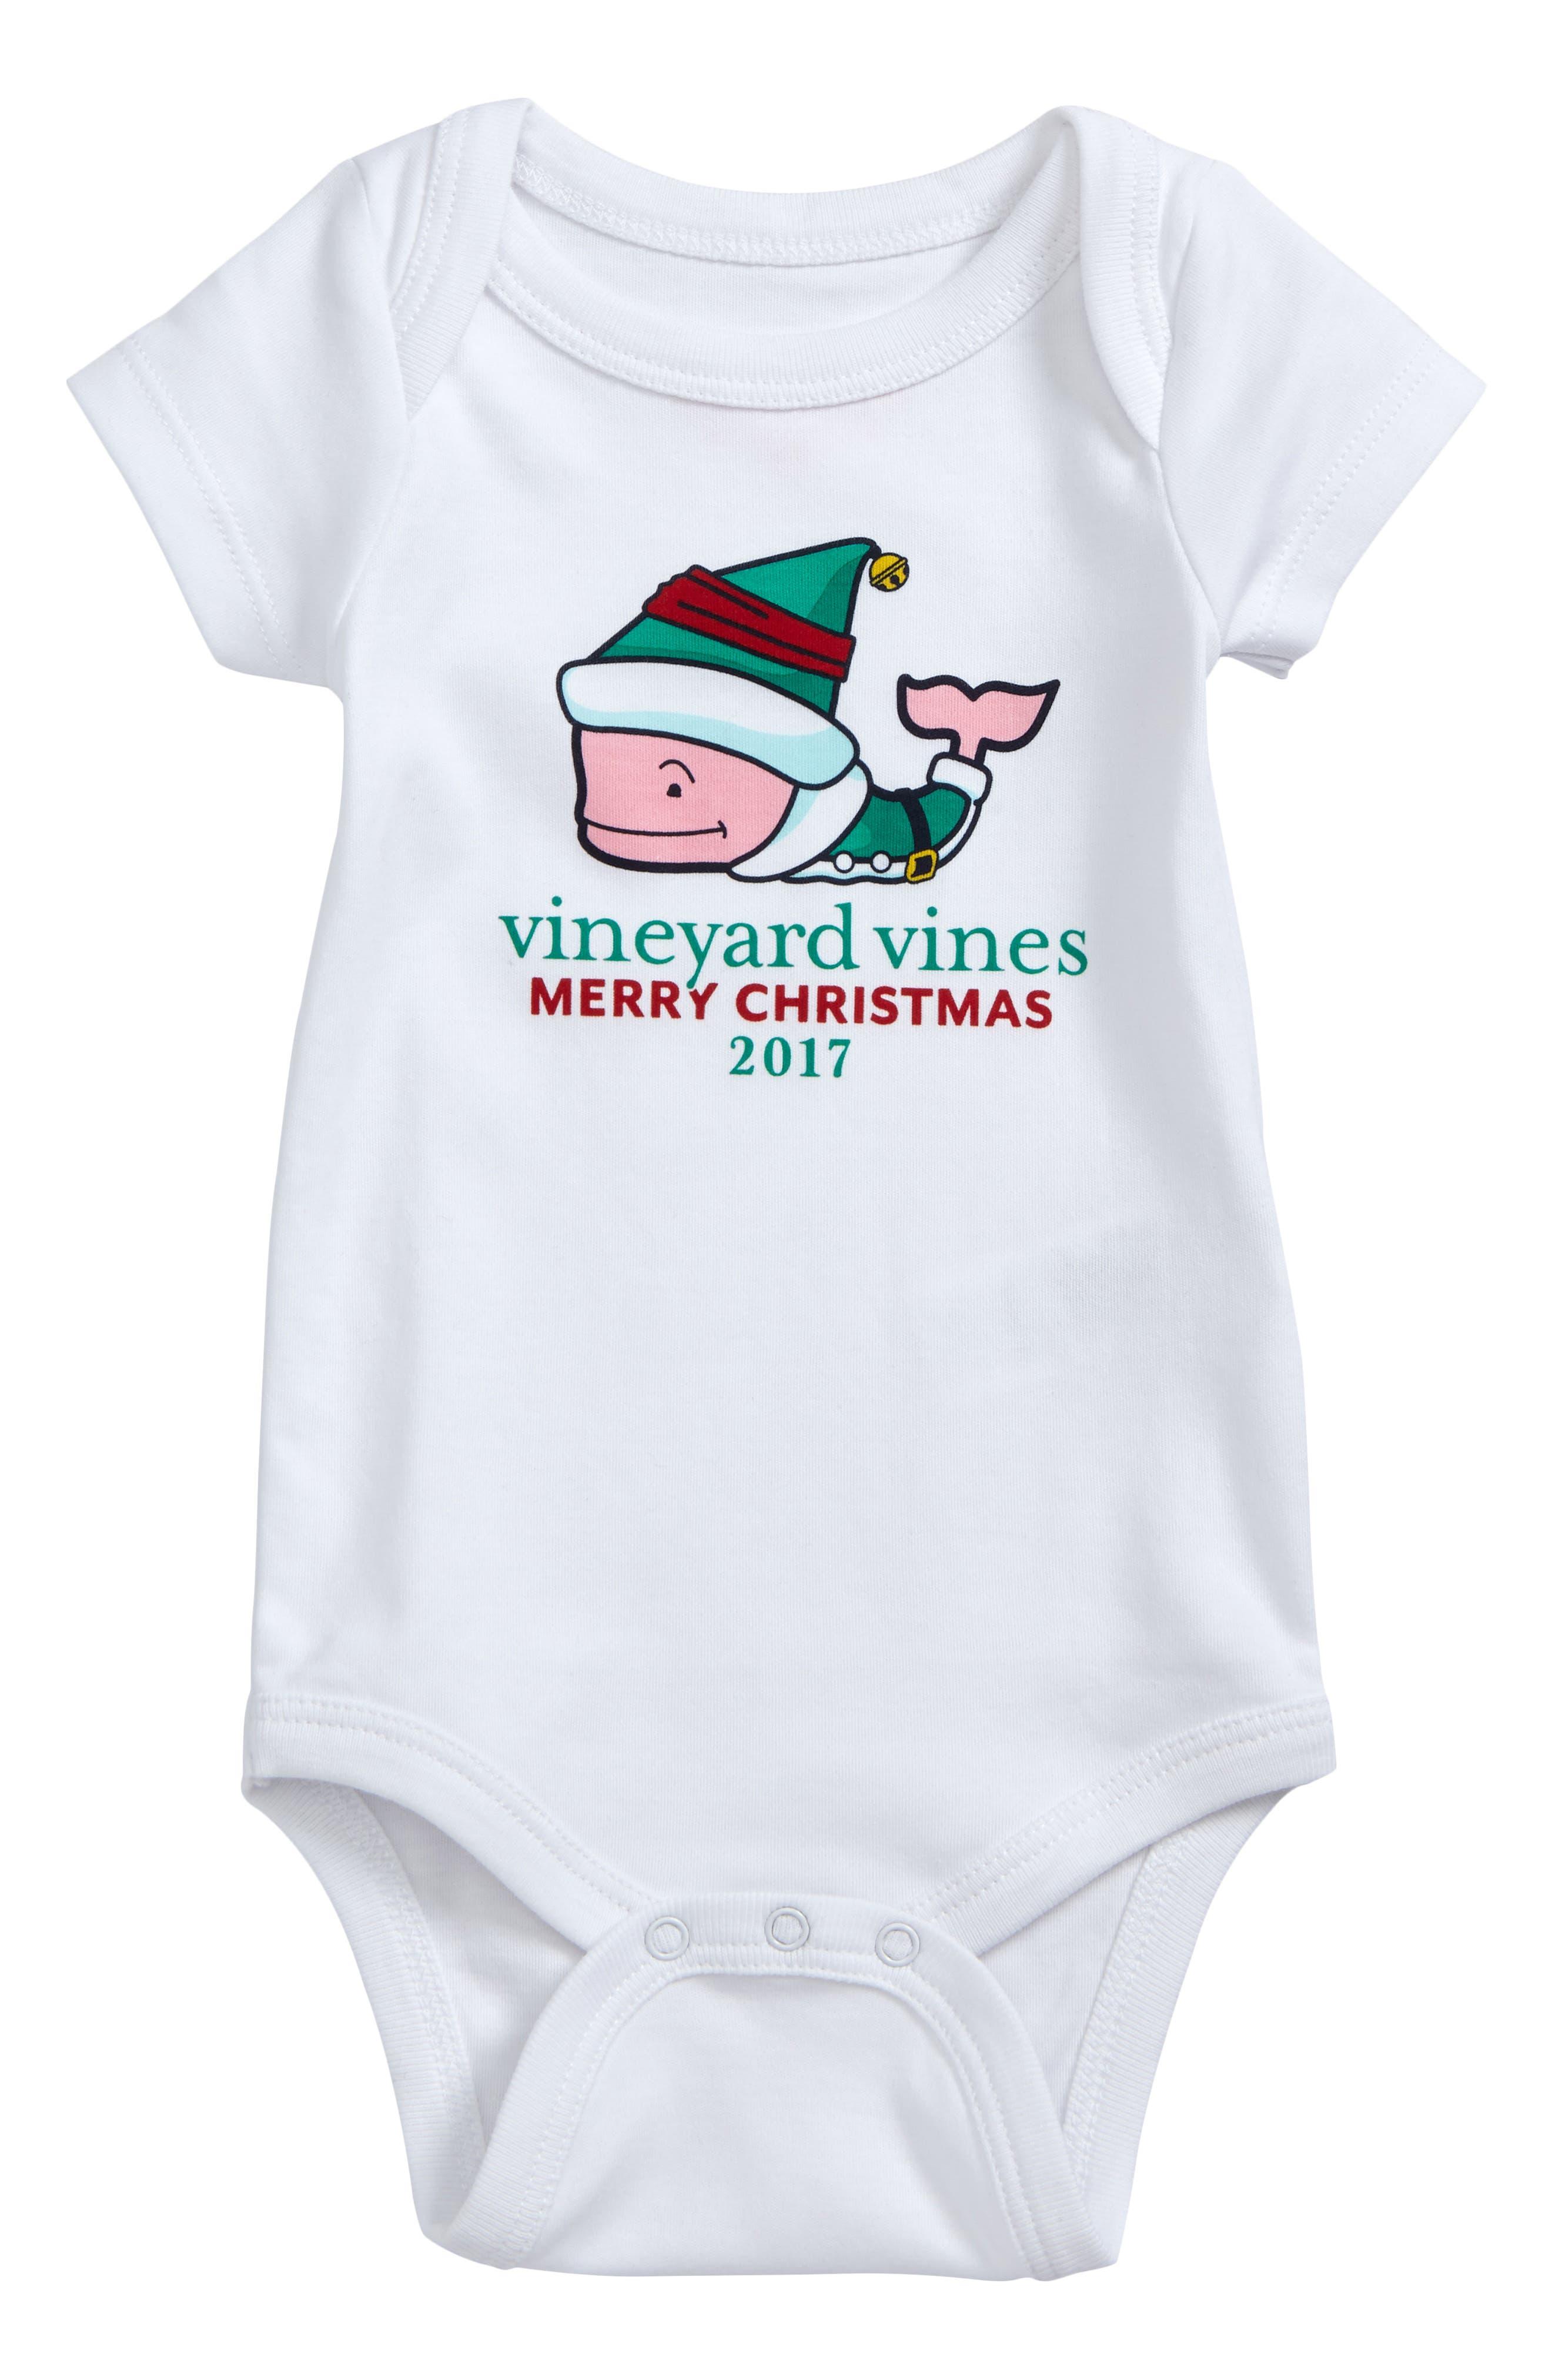 vineyard vines Elf Whale Merry Christmas 2017 Bodysuit (Baby)